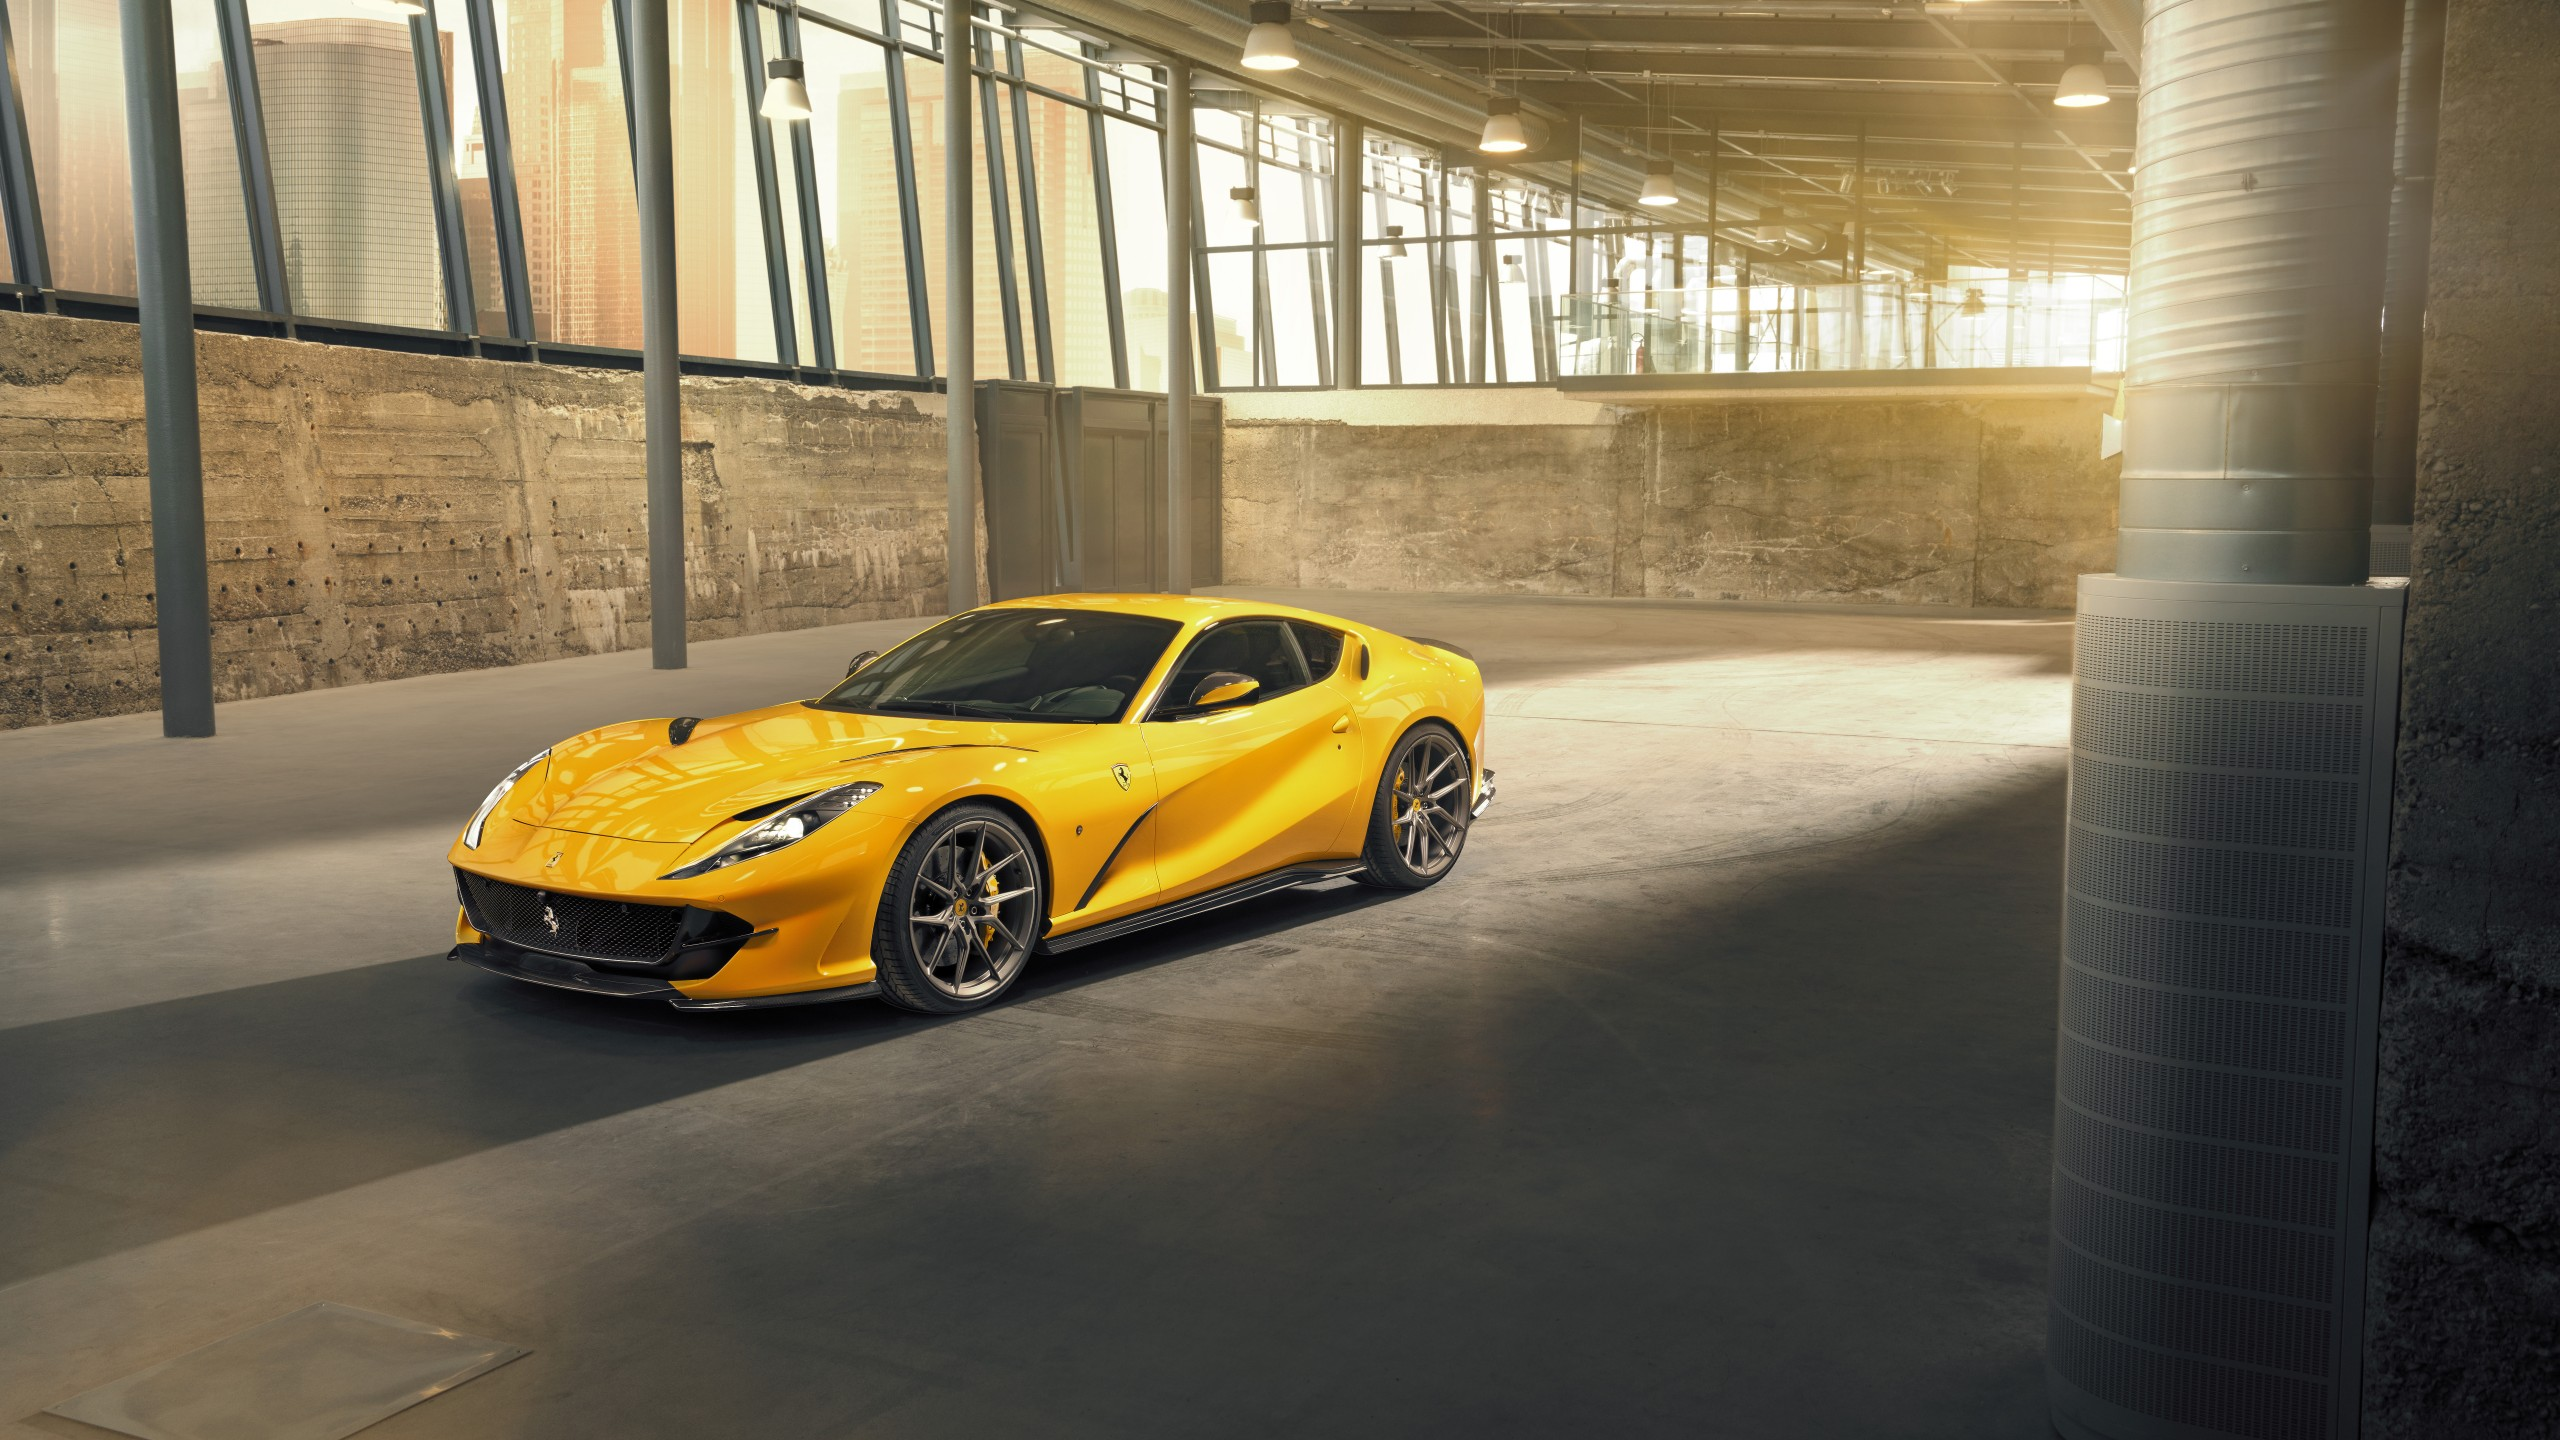 Novitec Ferrari 812 Superfast 2019 4K 8K 4 Wallpaper | HD ...